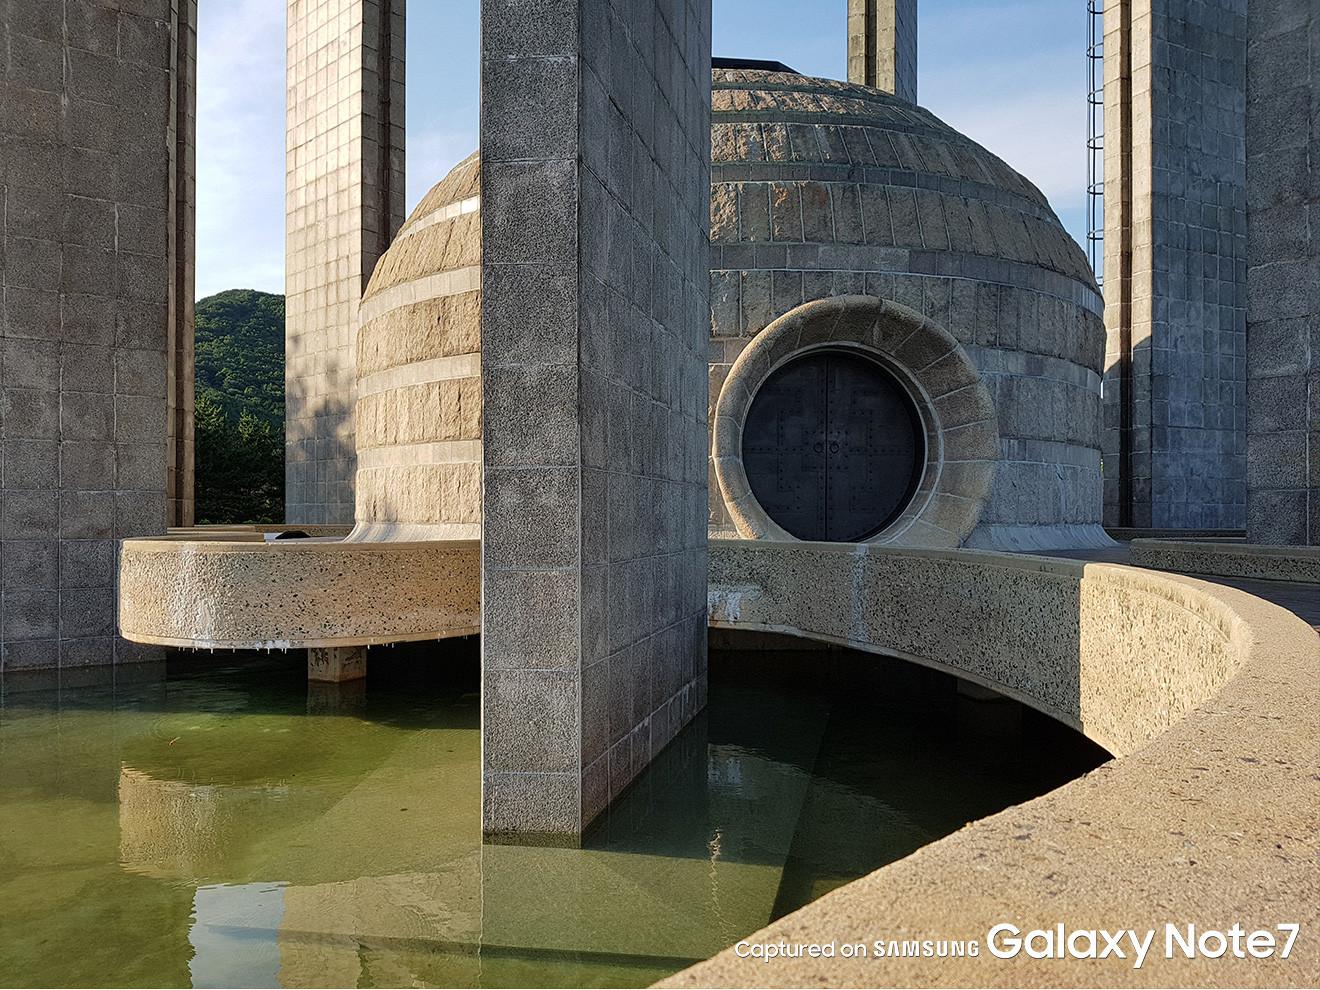 1470170769_samsung-galaxy-note-7-official-camera-samples-14.jpg